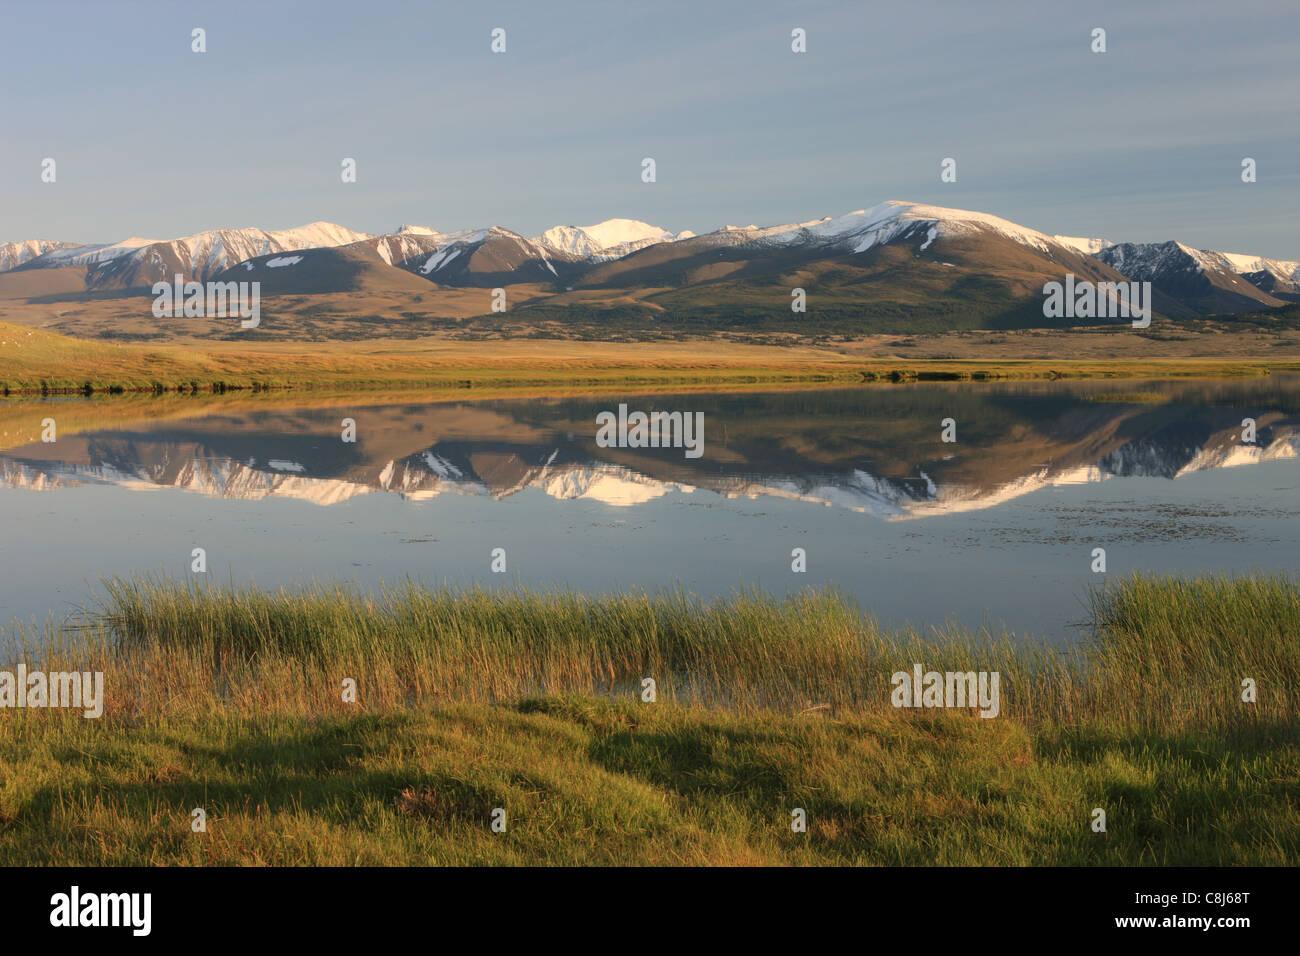 Altay Tavan Bogd National Park, Hurgan Nuur, Bayan Ölgii, Mongolia, Mongolian Altai, mountains, Mountain-Valley, Stock Photo